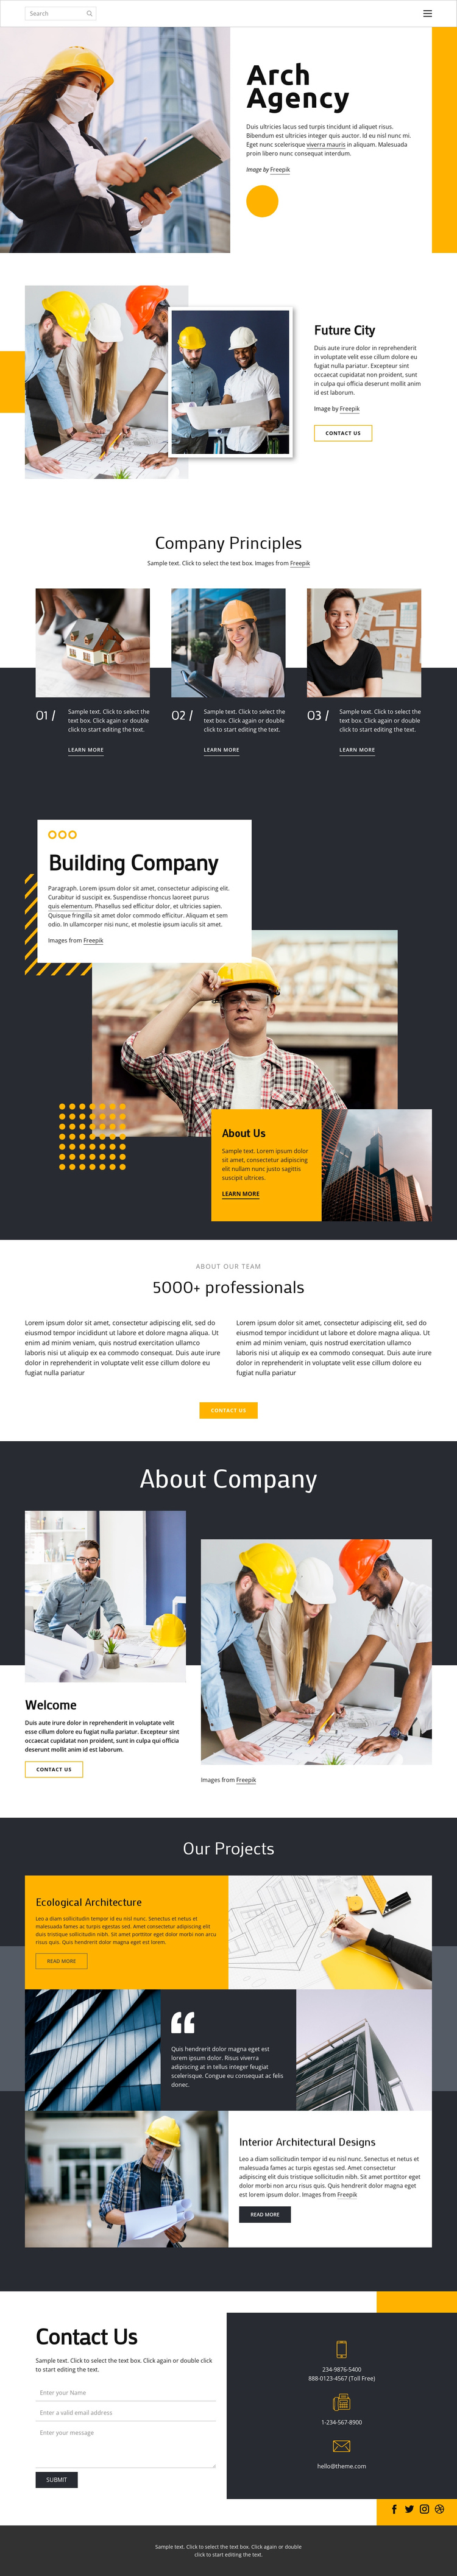 Award winning architects Website Builder Software